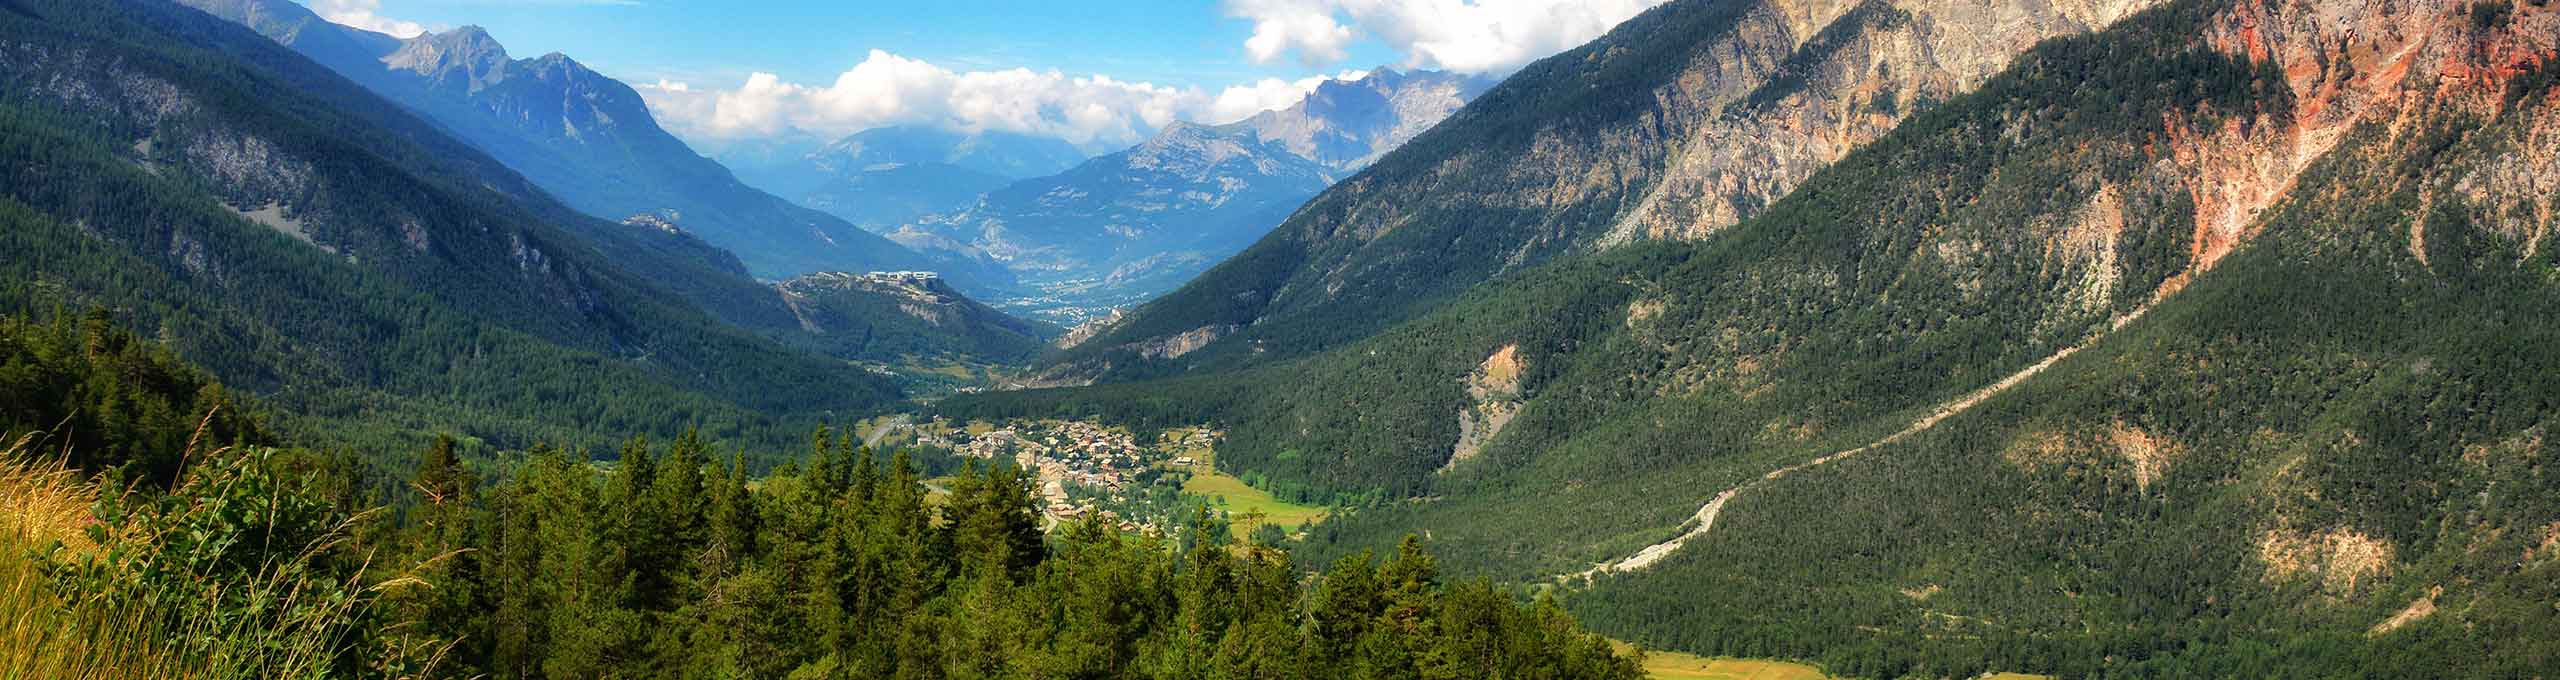 Cesana Torinese, alta Val Susa e Chisone